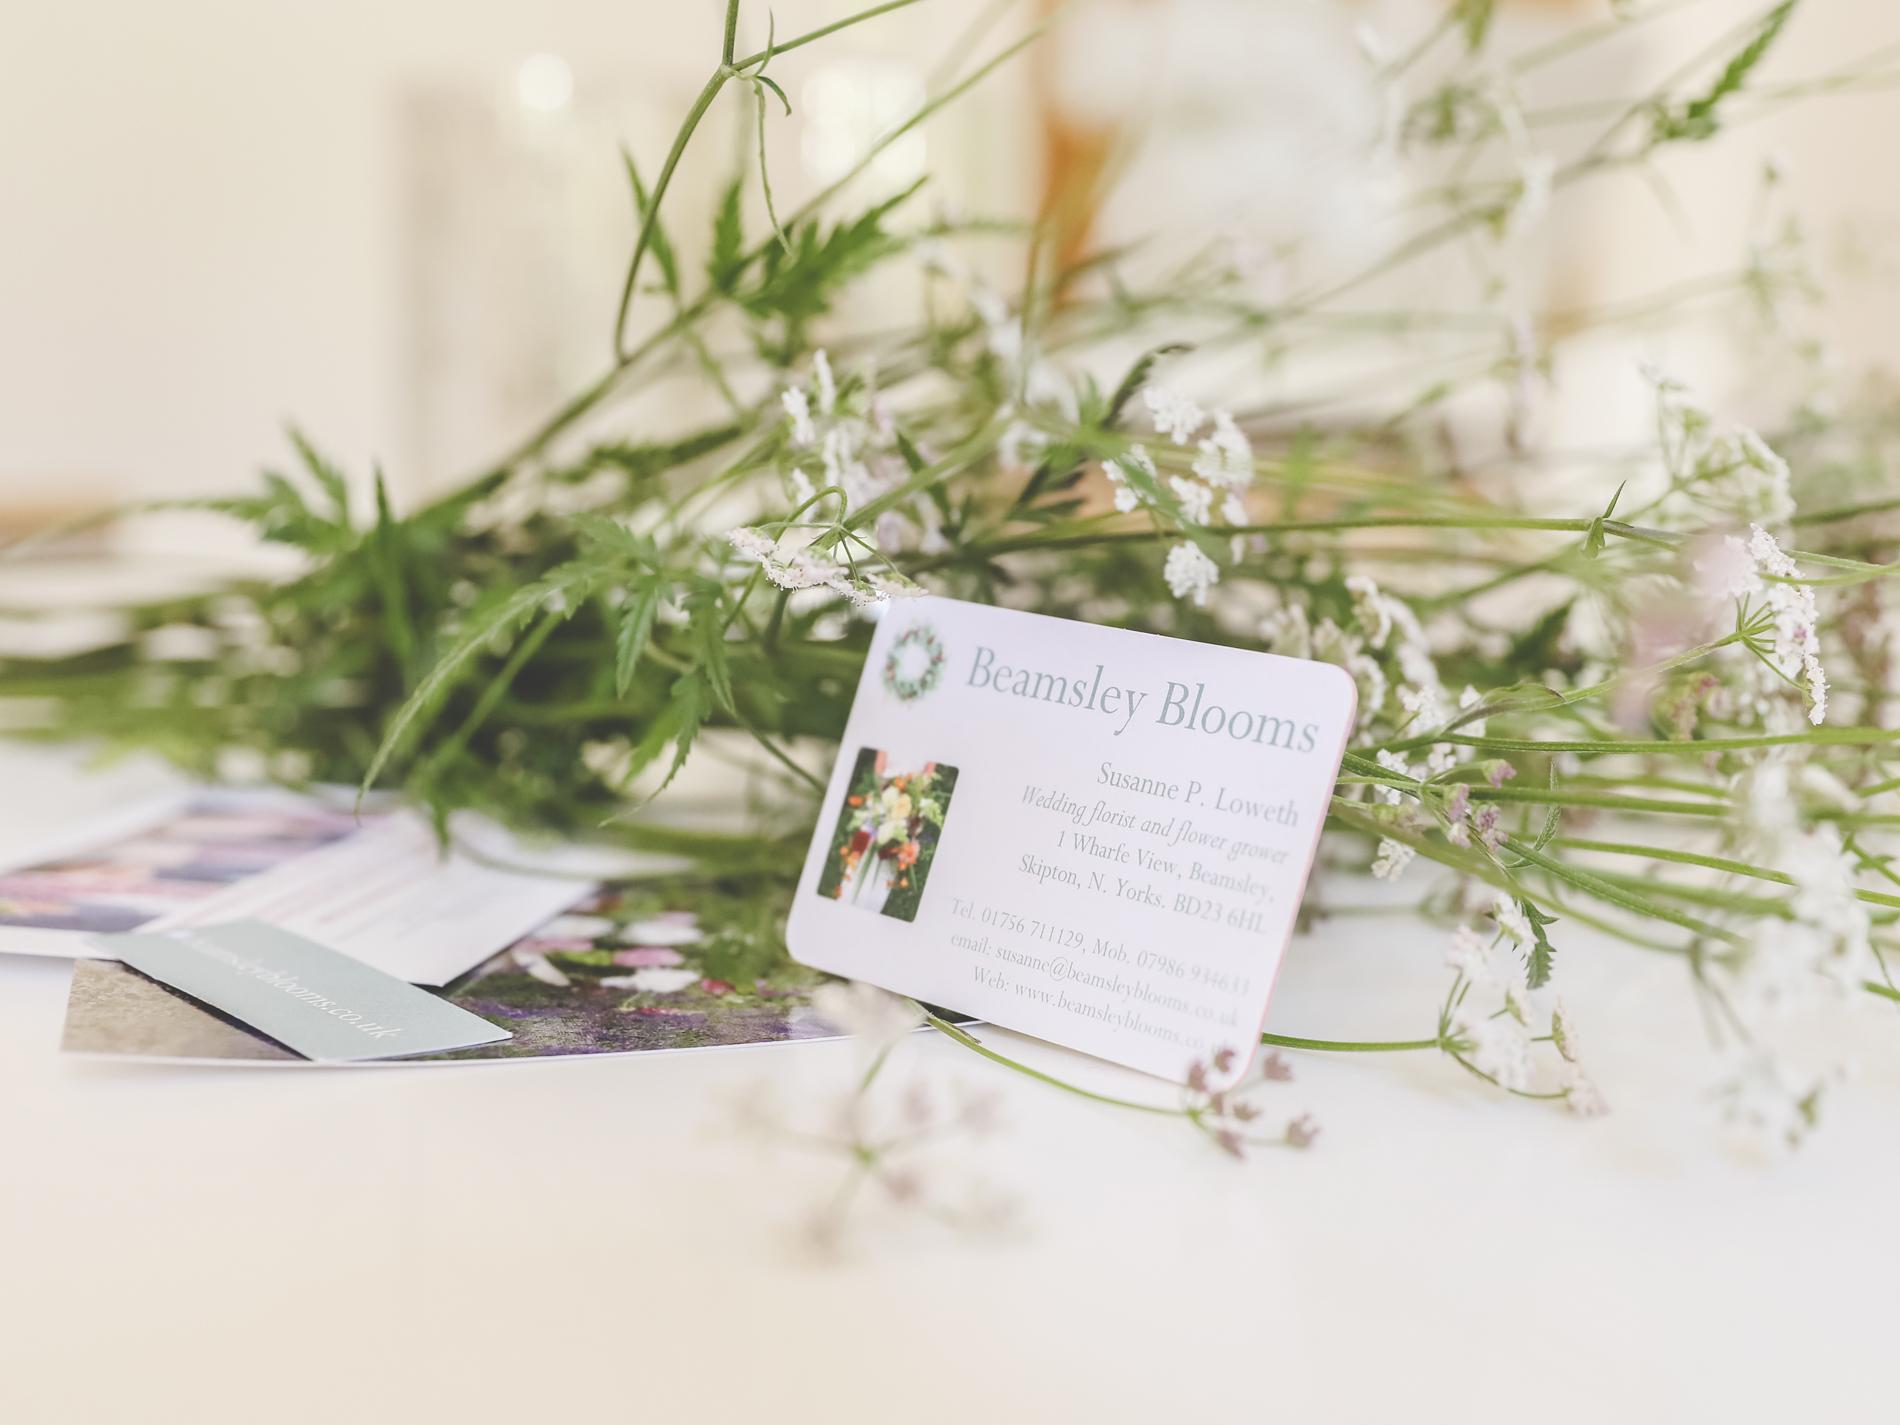 professional photographs, branding, wedding florist, yorkshire wedding business,